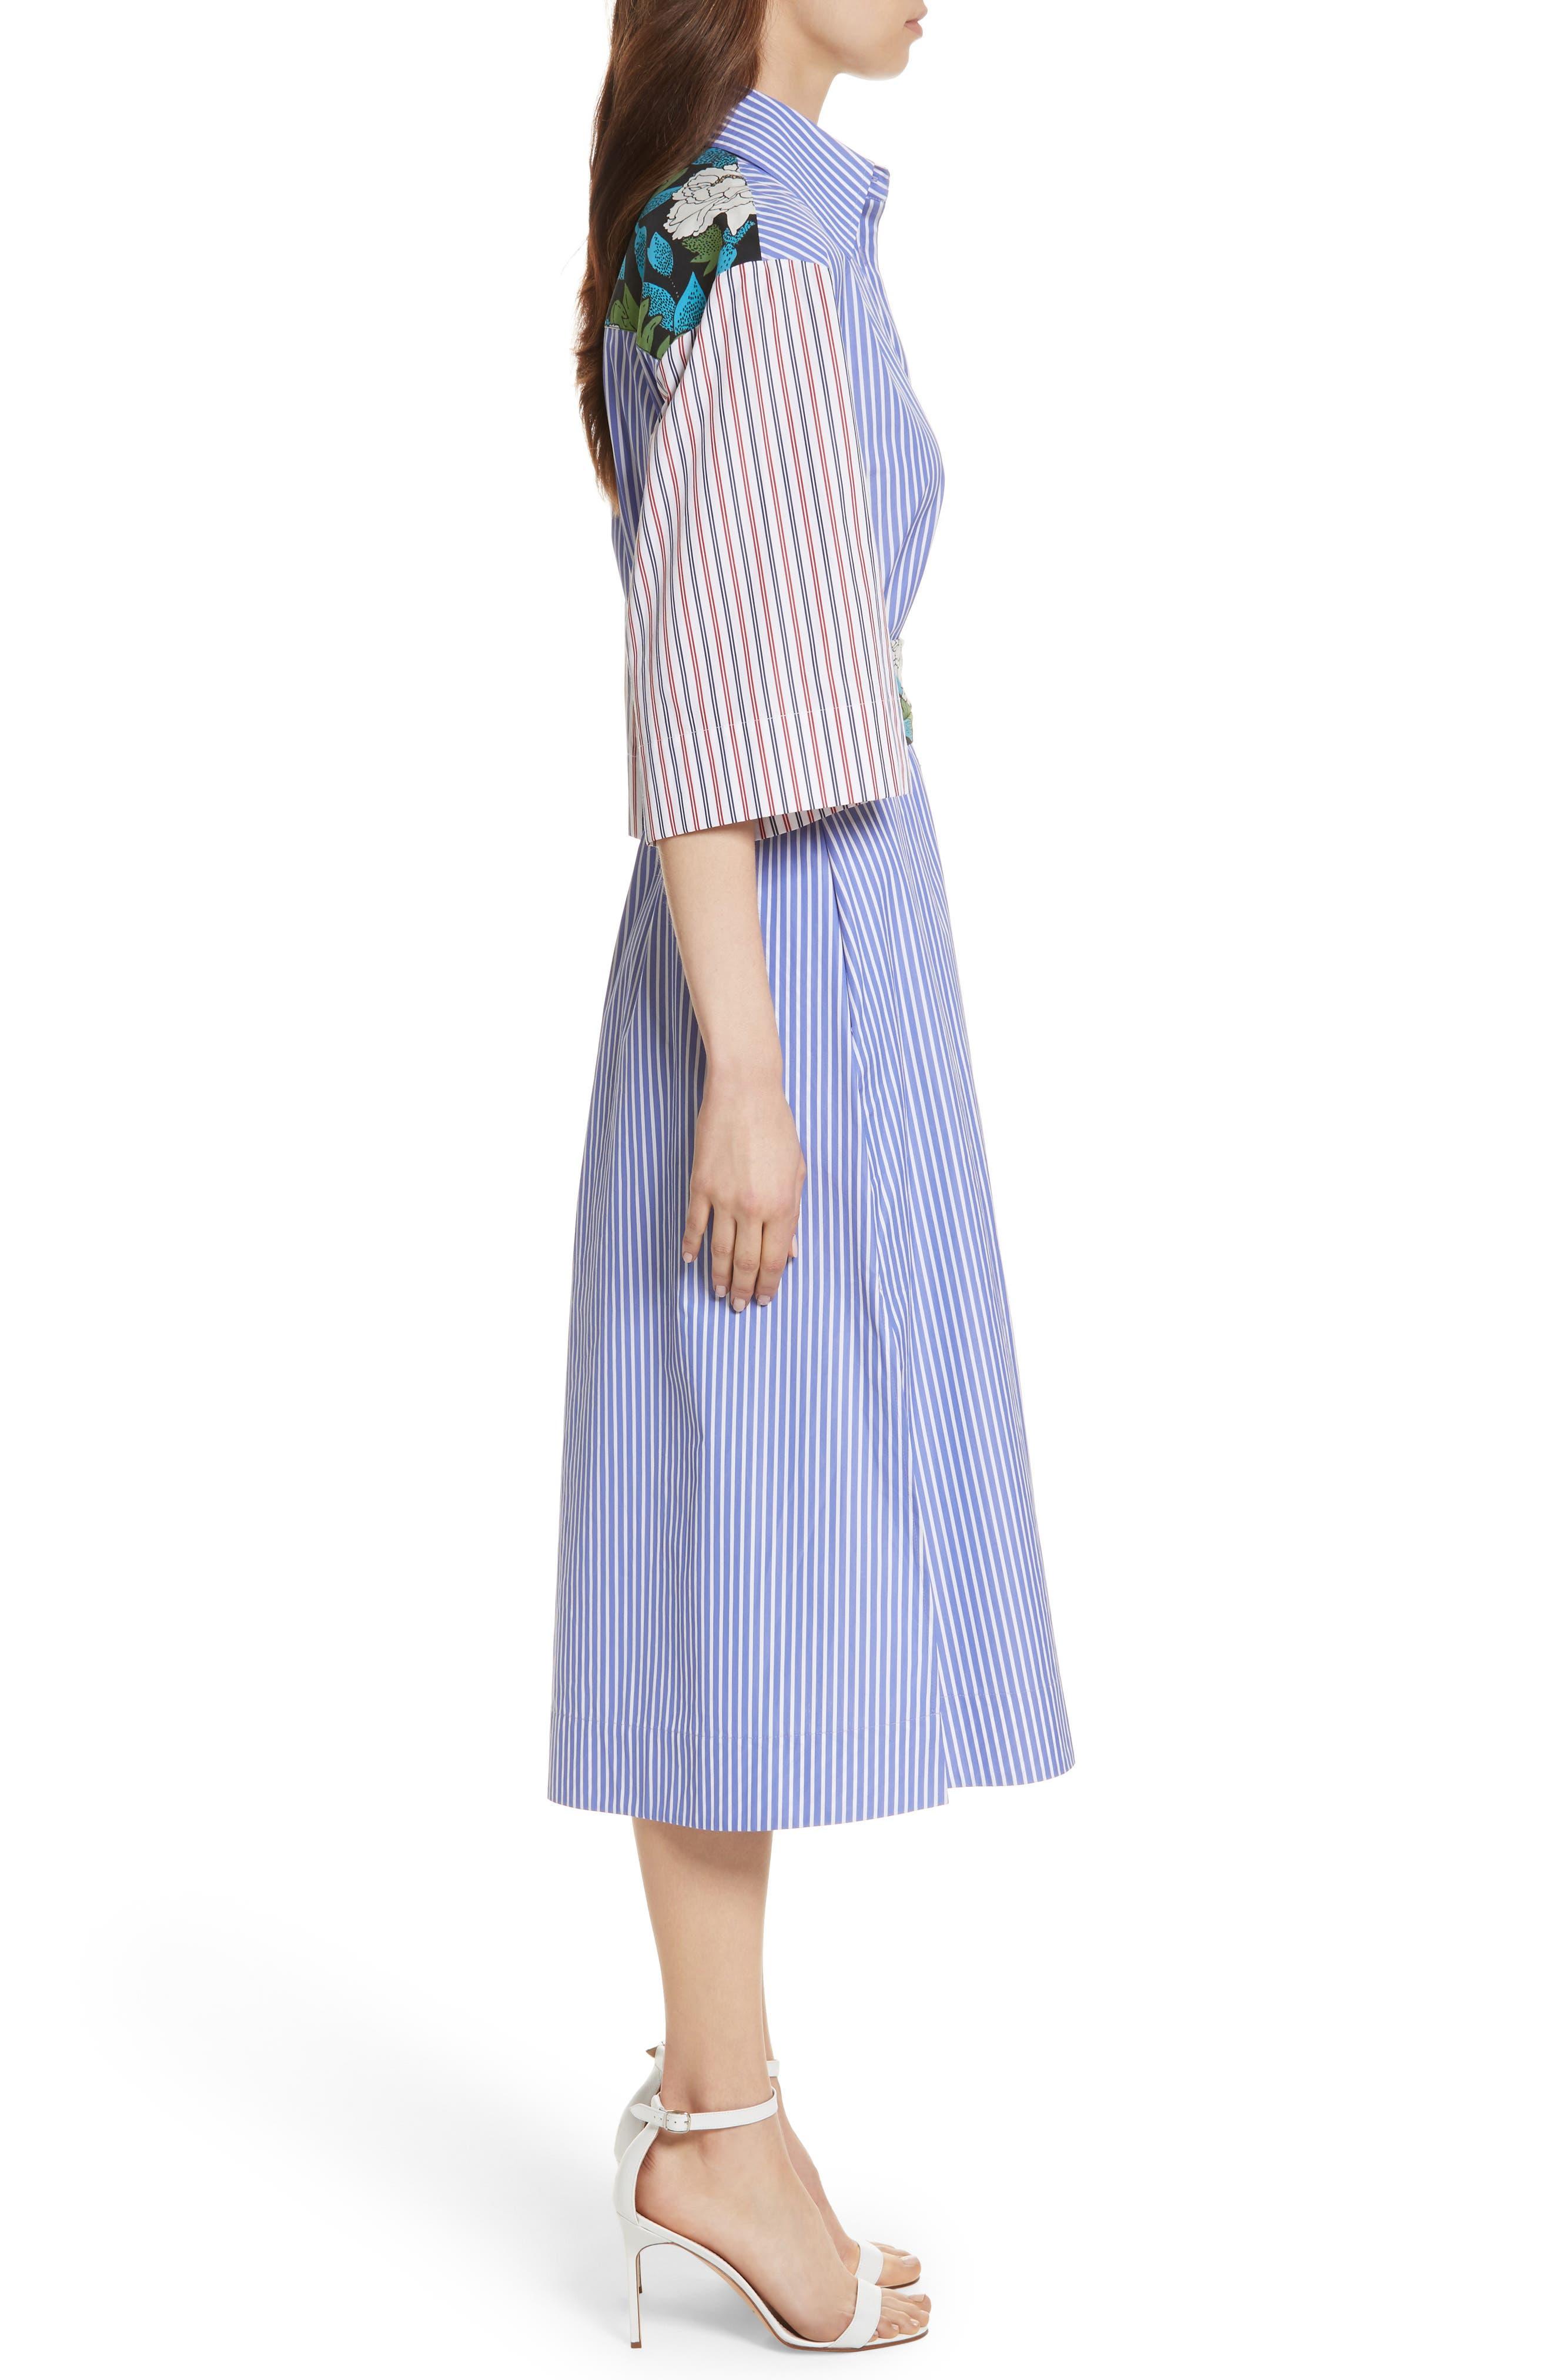 Diane von Furstenberg Mixed Print Cotton Shirtdress,                             Alternate thumbnail 3, color,                             Blue White Wide Stripe